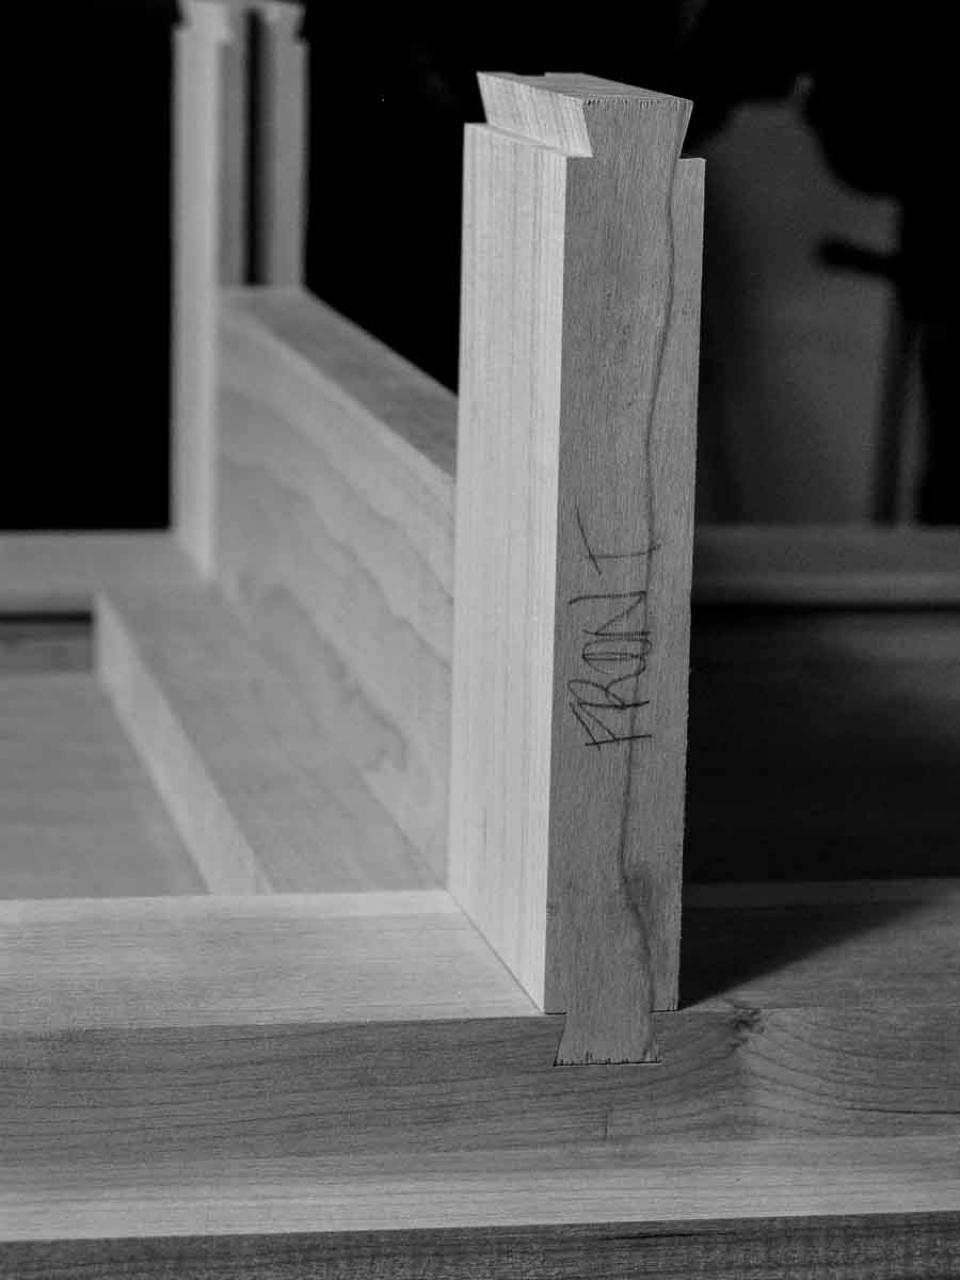 assembling a sliding dovetail joint 4